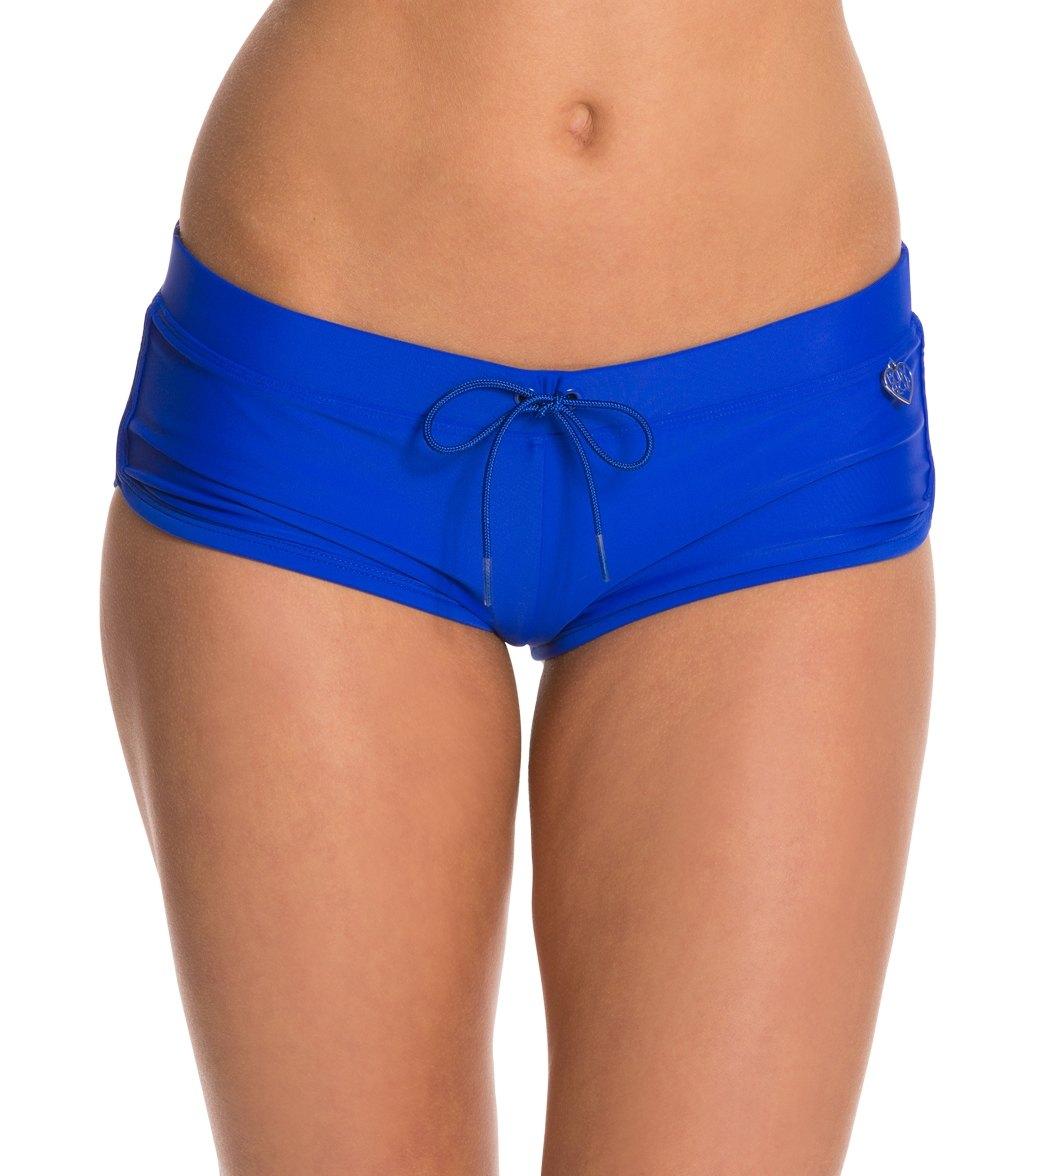 ab97fb400f Body Glove Swimwear Smoothies Sidekick Sporty Boy Short Bikini Bottom at  SwimOutlet.com - Free Shipping